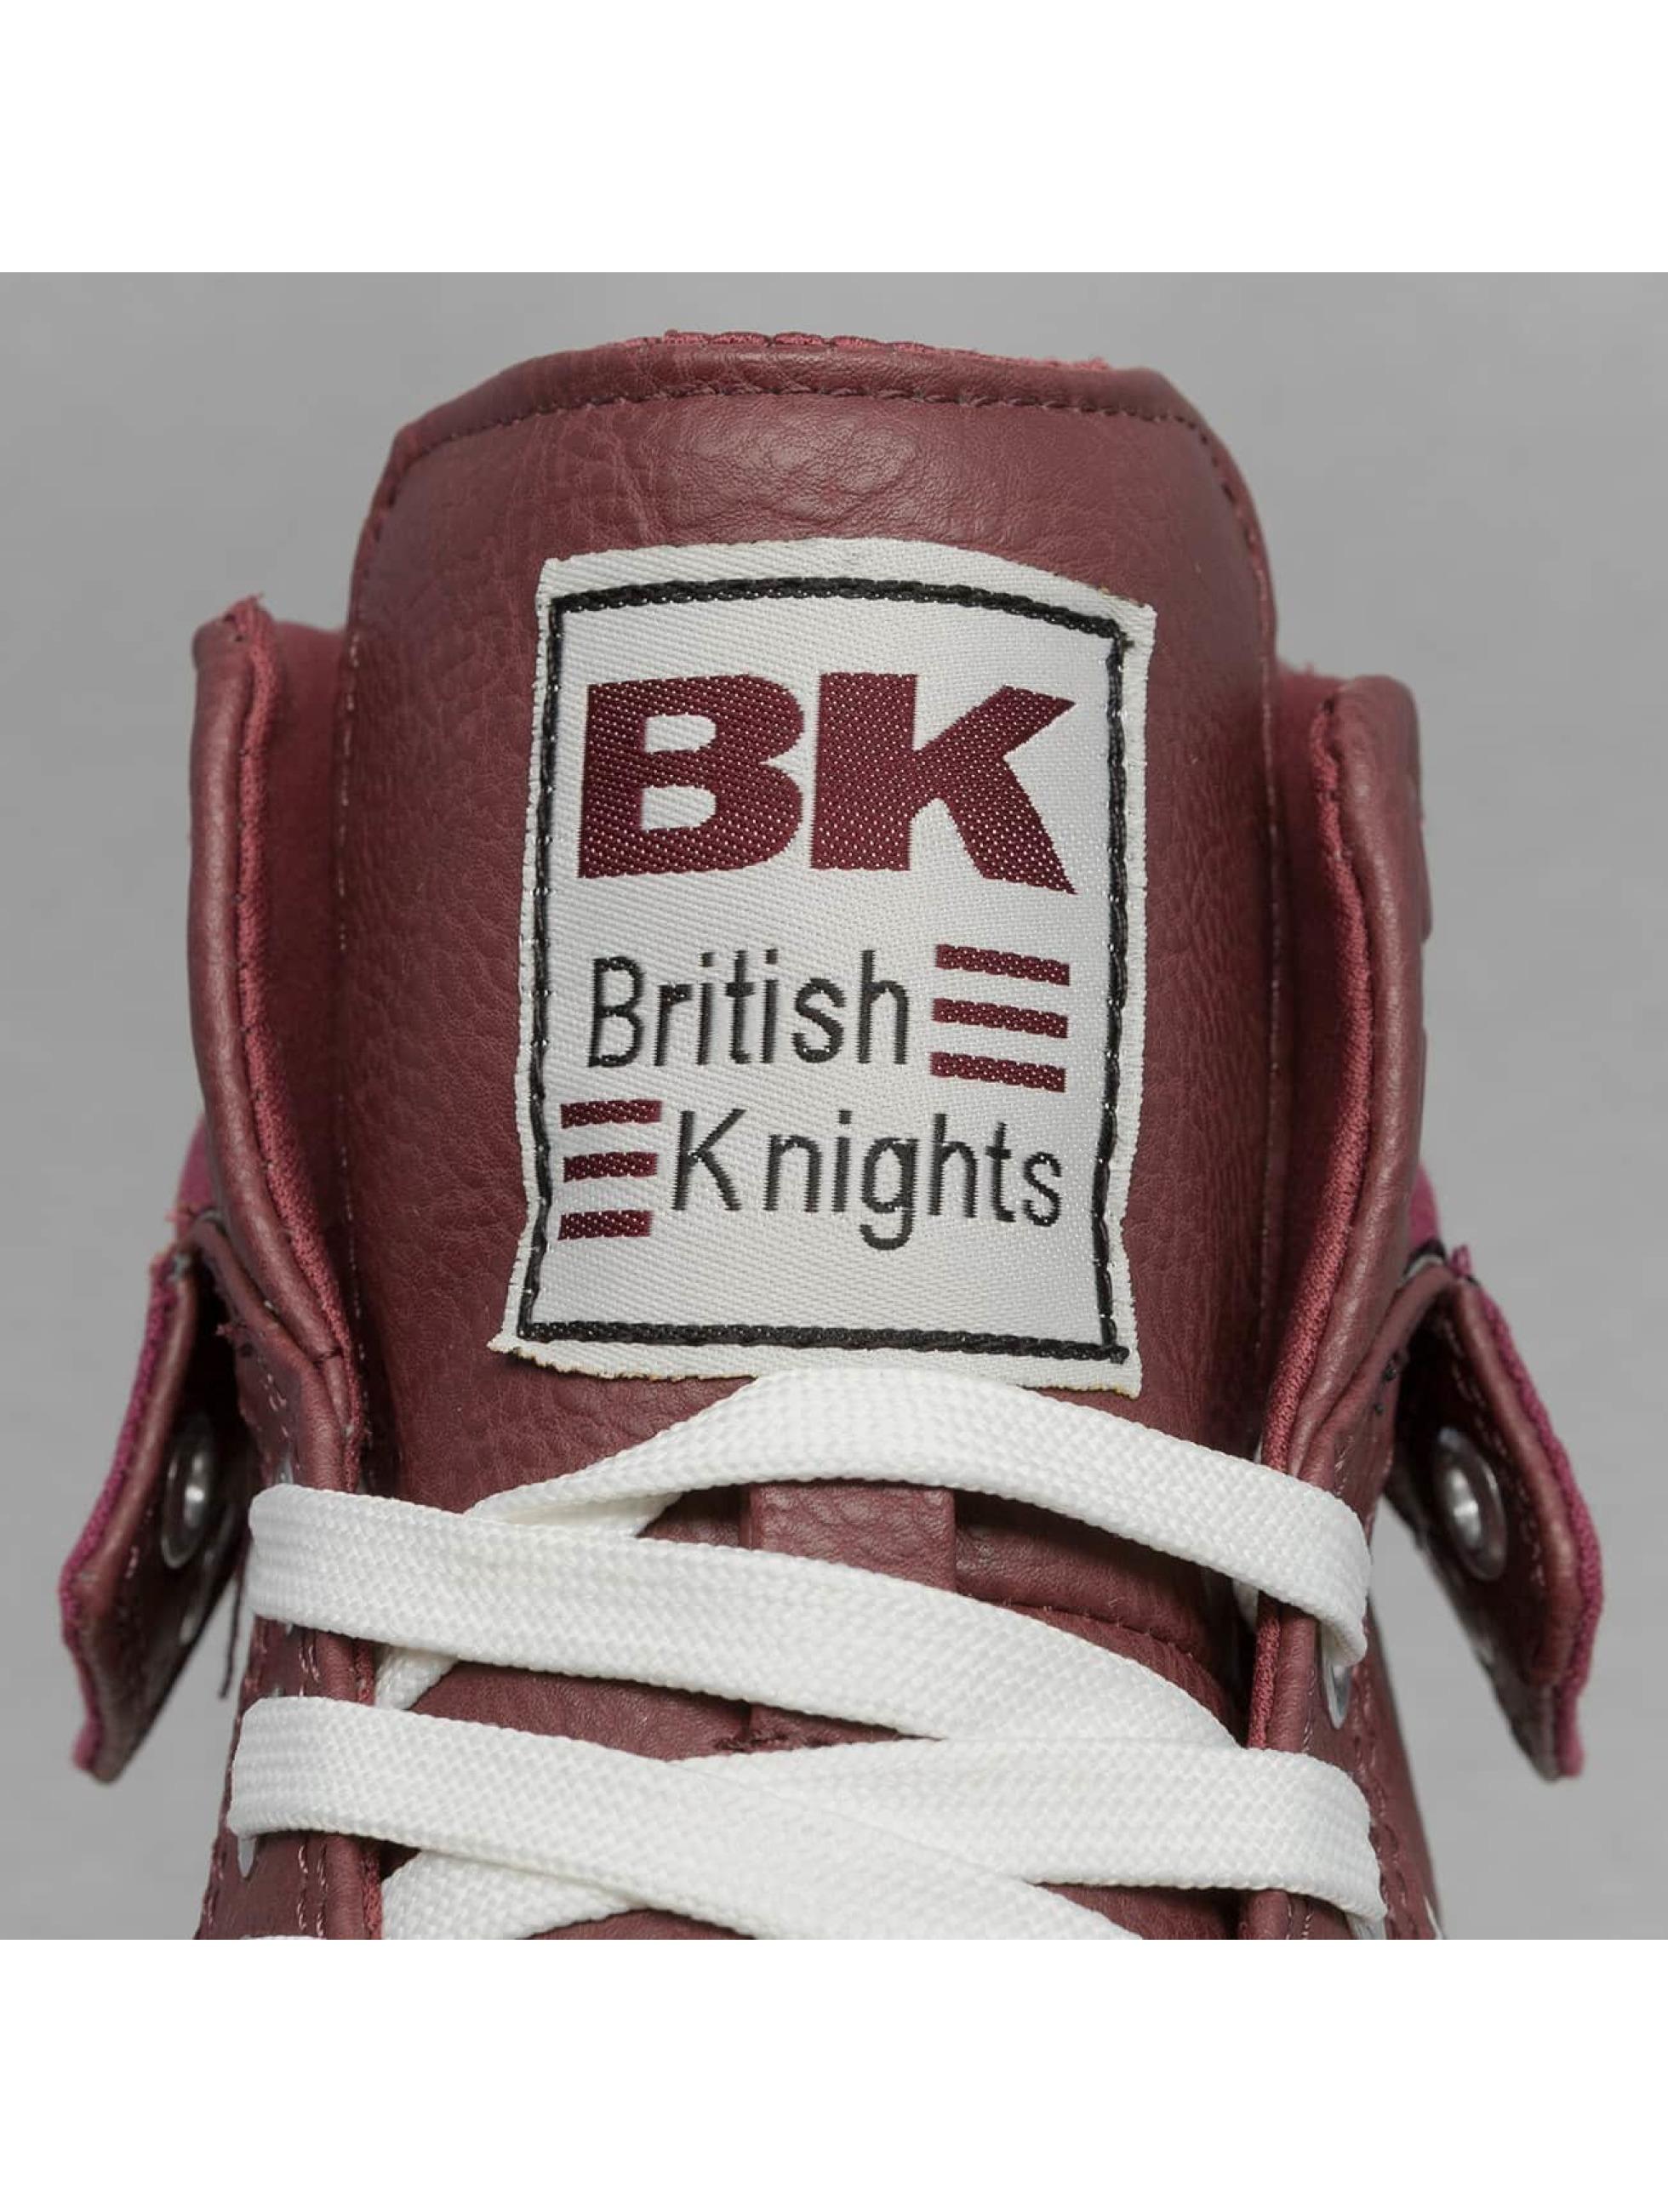 British Knights Tennarit Roco PU punainen